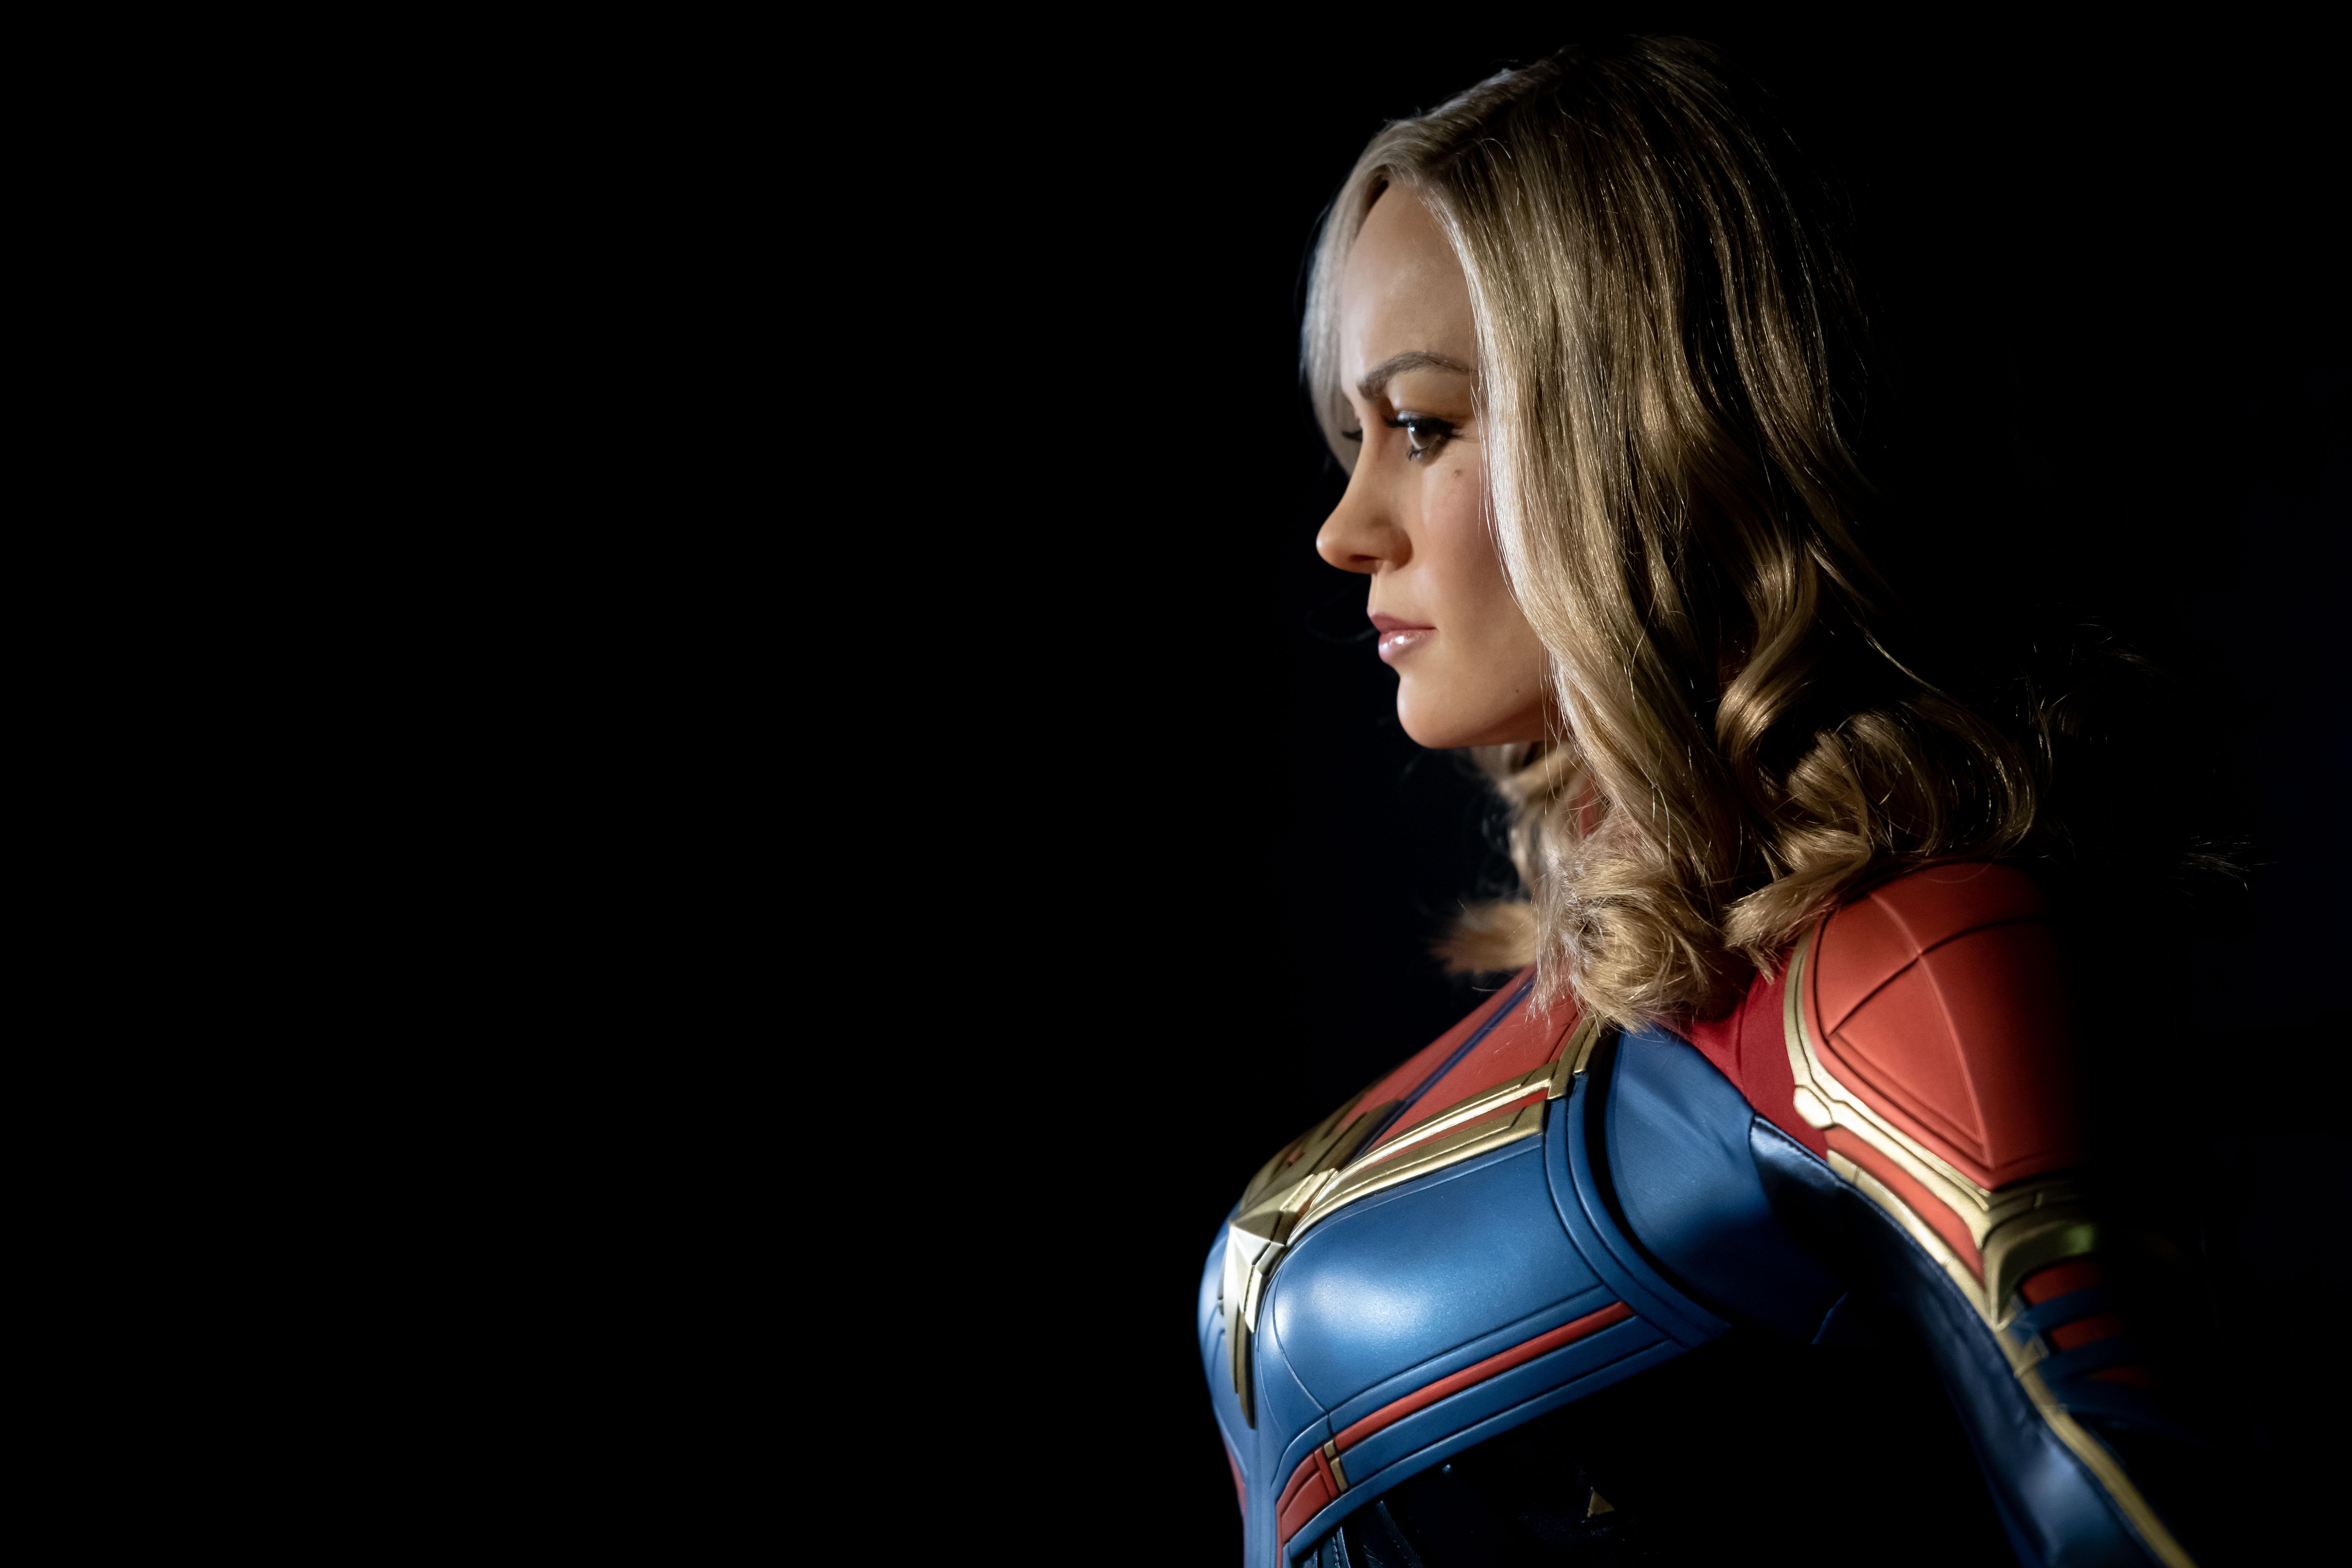 5k Captain Marvel, HD Superheroes, 4k Wallpapers, Images ...